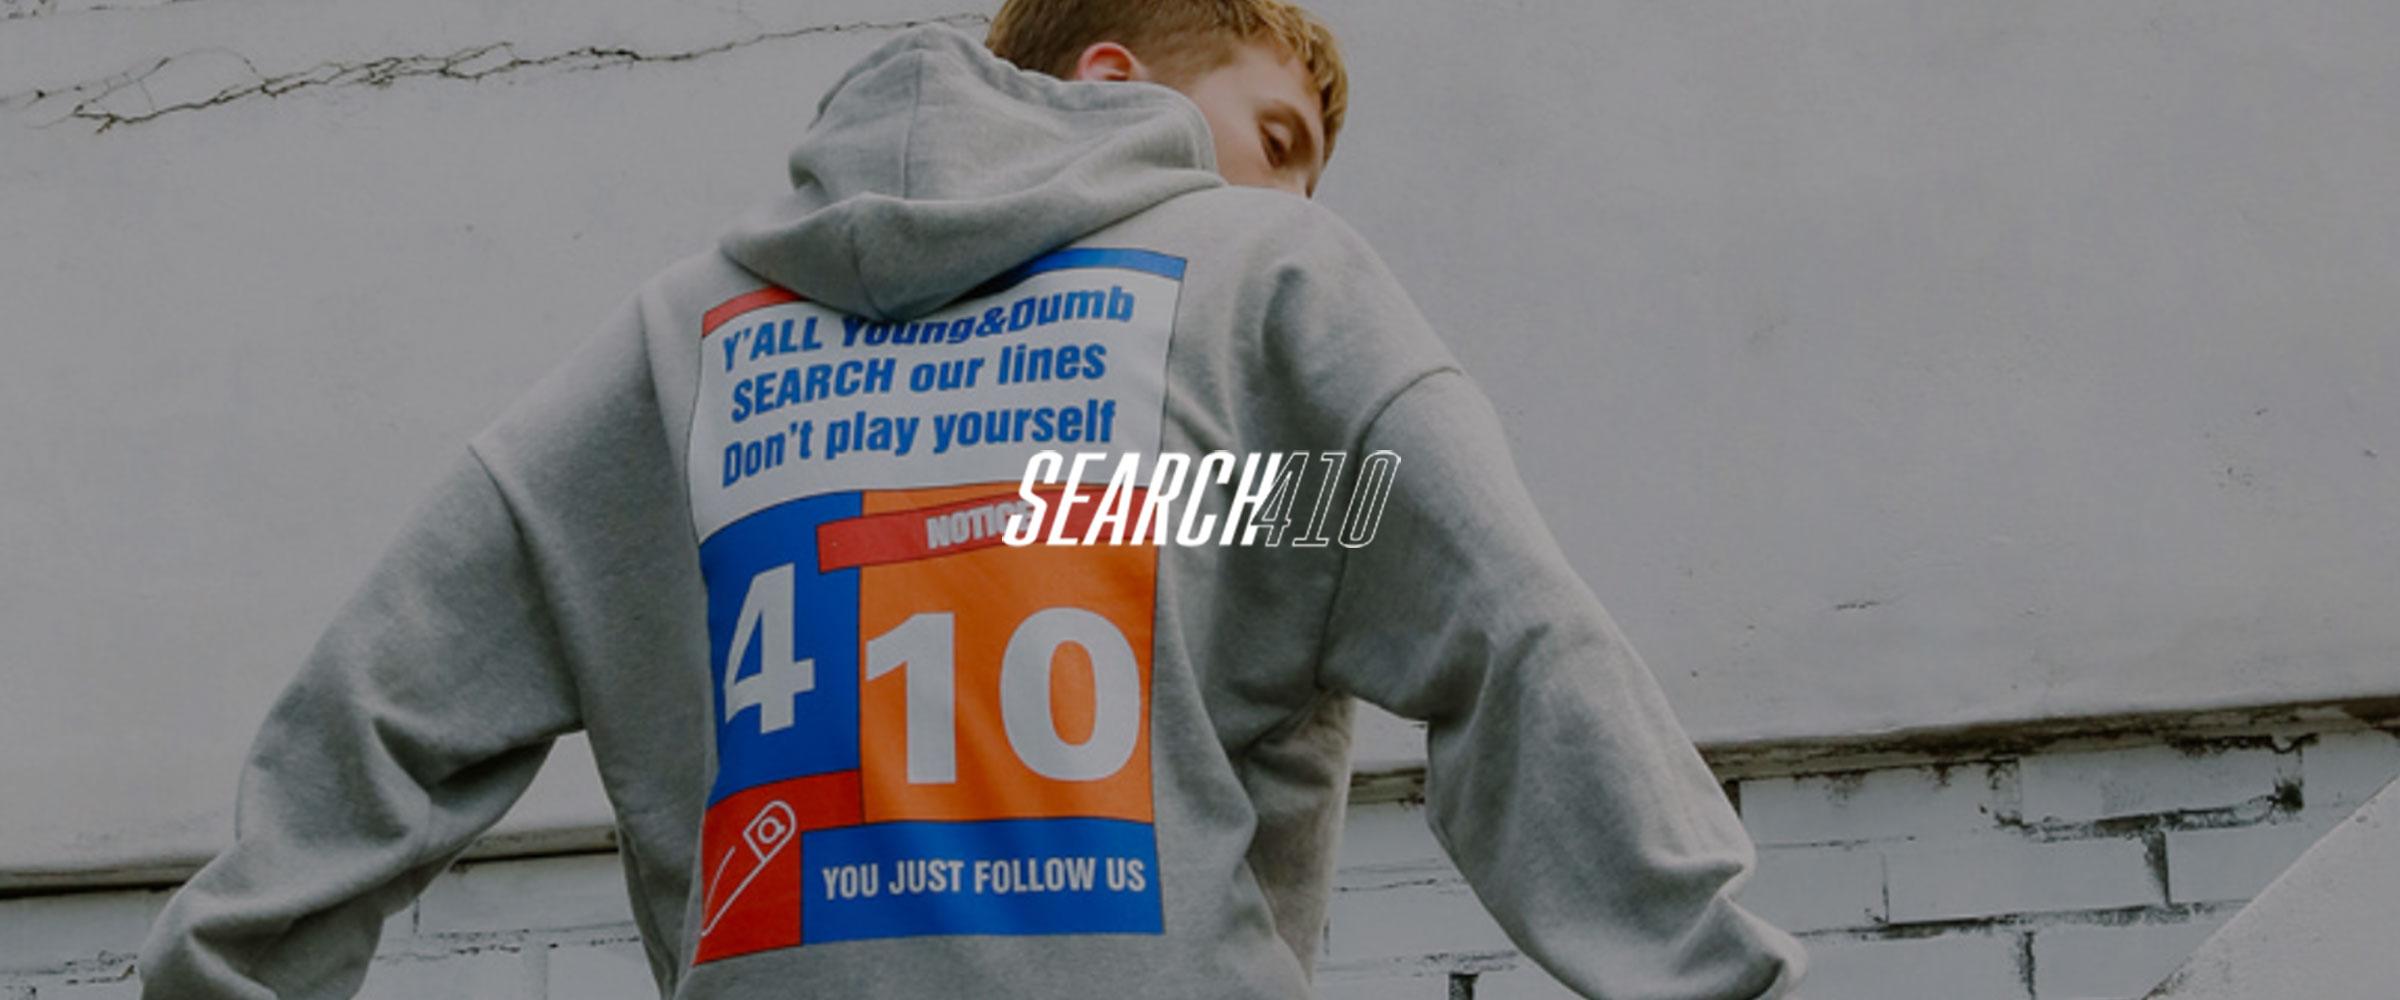 search410.jpg